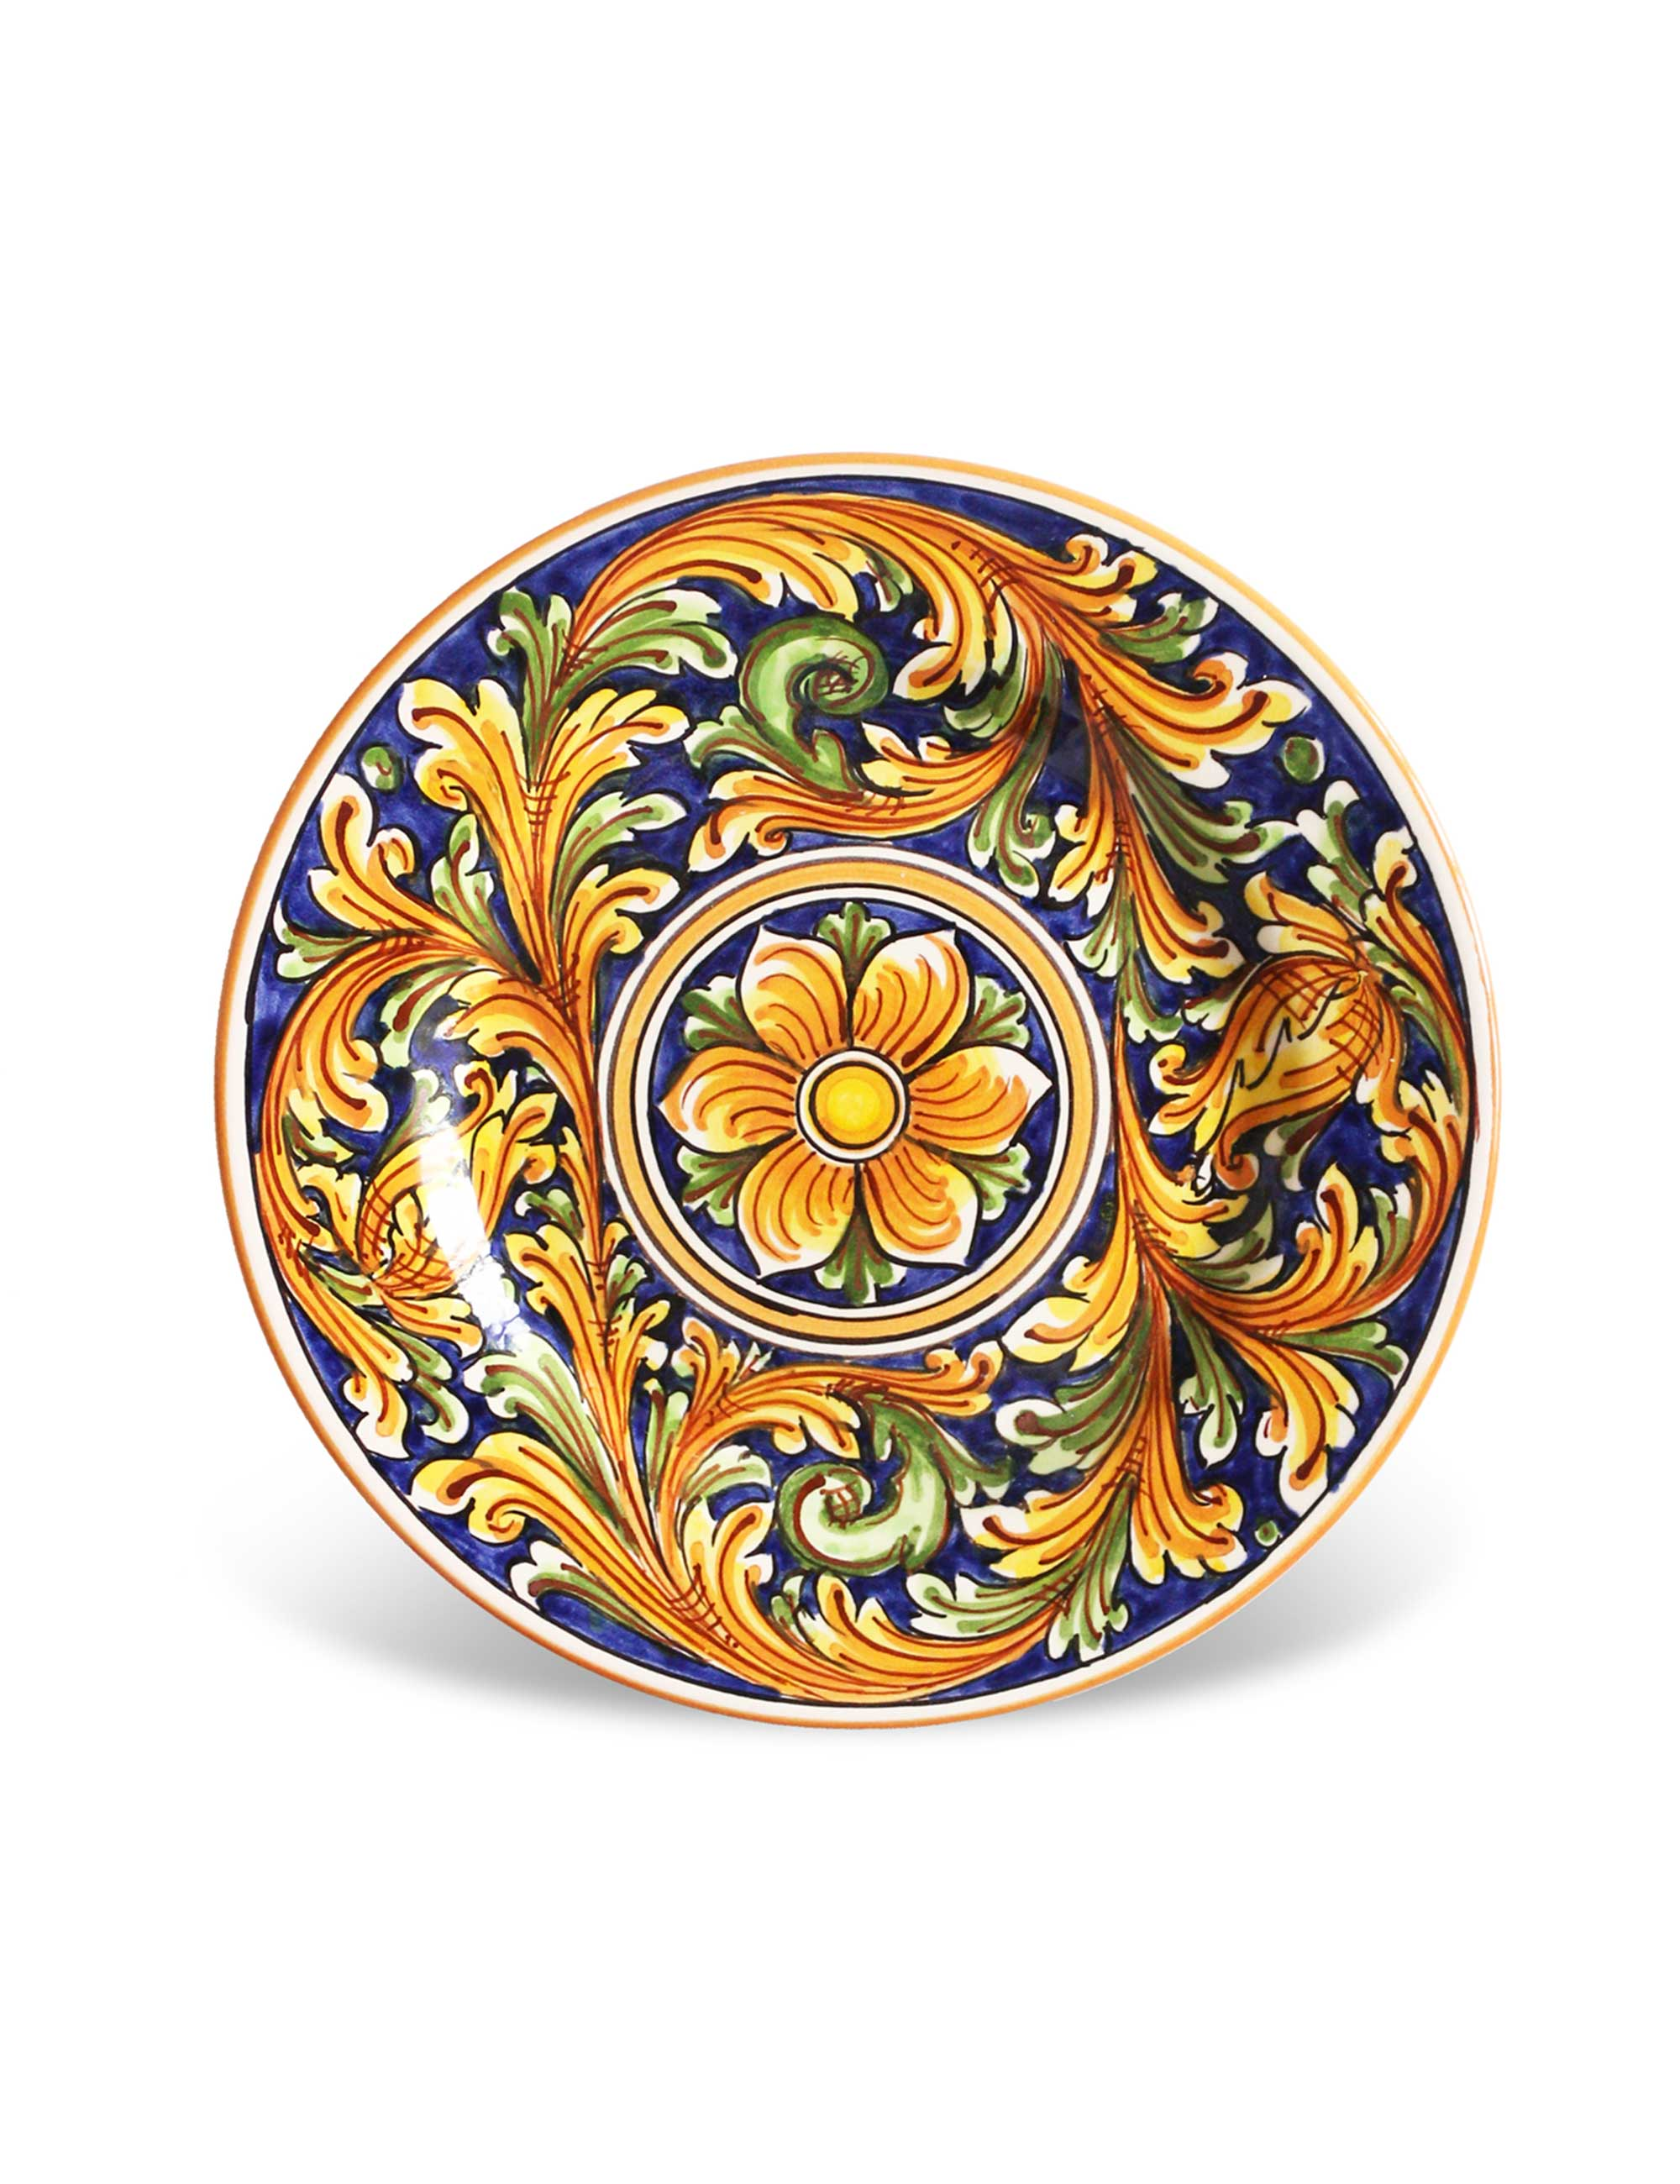 piatti ceramica siciliana dessert decorati